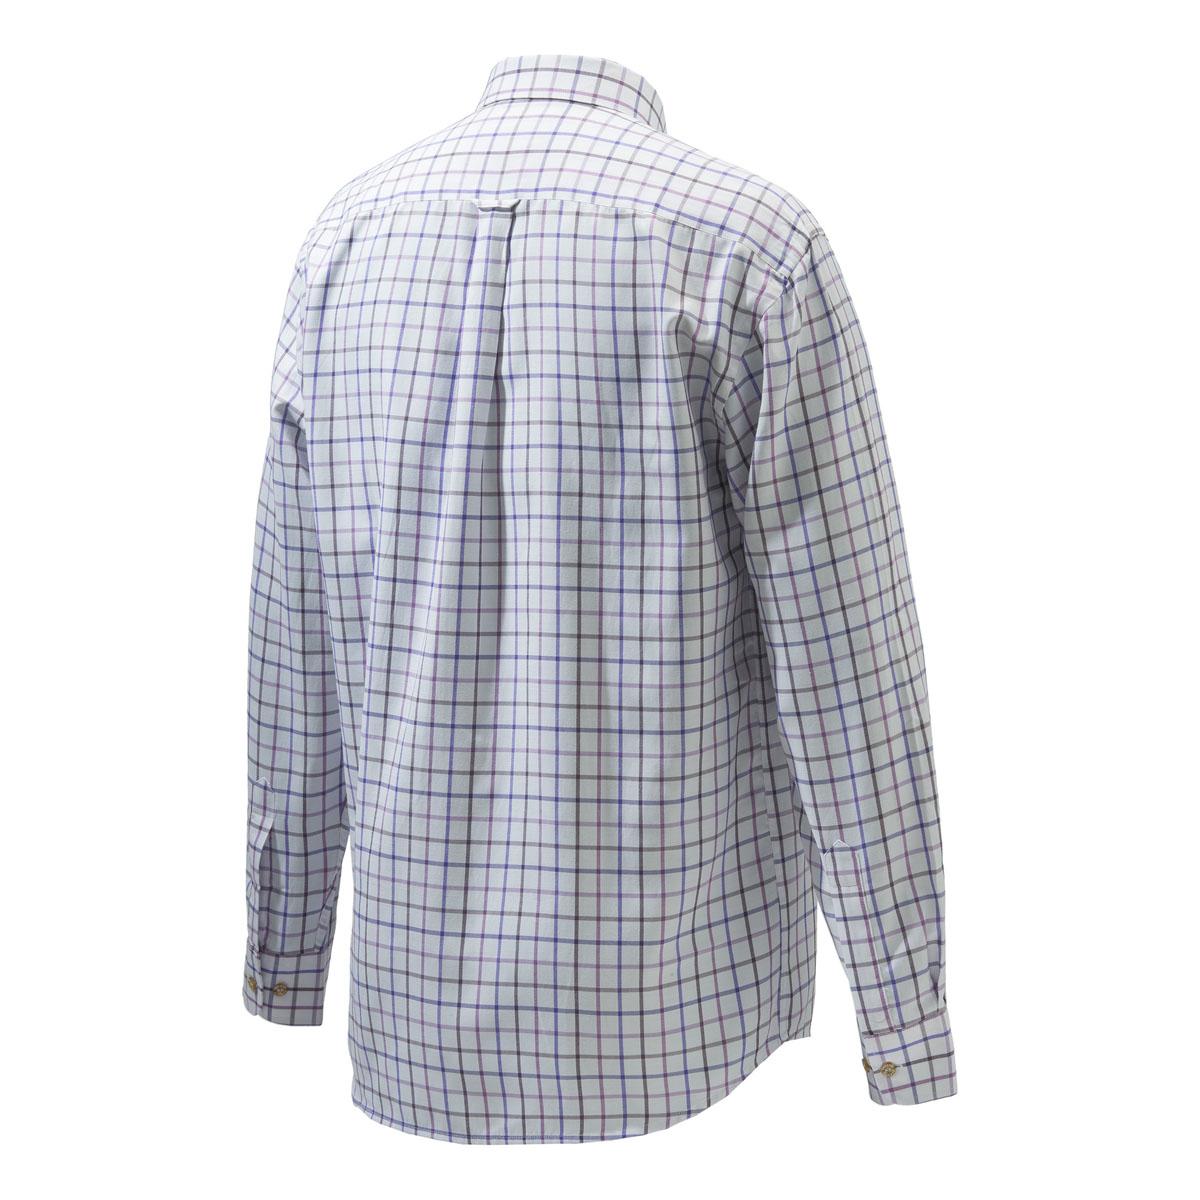 Beretta Classic Shirt – White & Violet Fancy Check